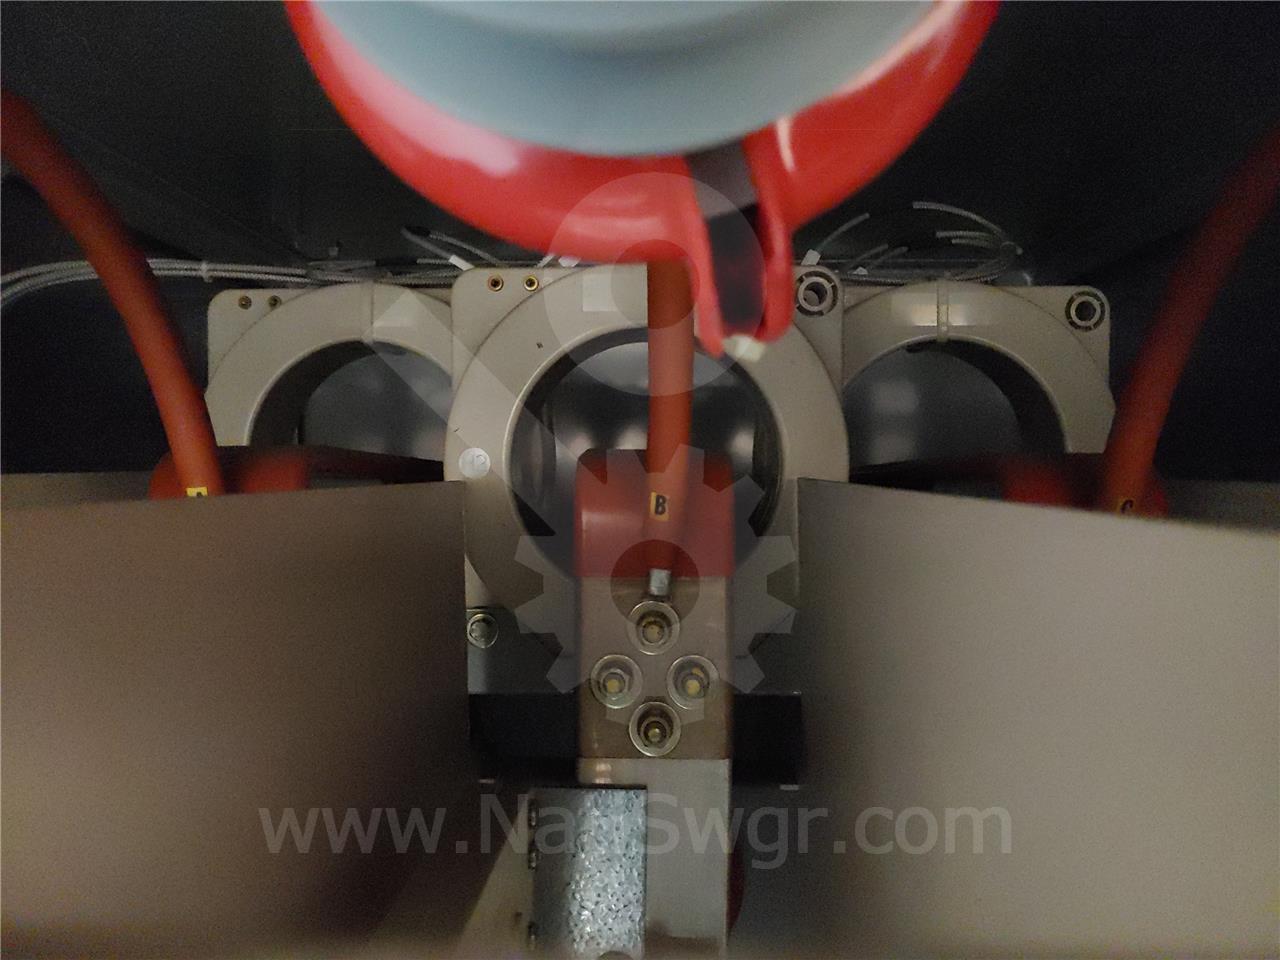 Instrument Transformer ITI MODEL 780 CURRENT TRANSFORMER 1200:5 UNUSED SURPLUS